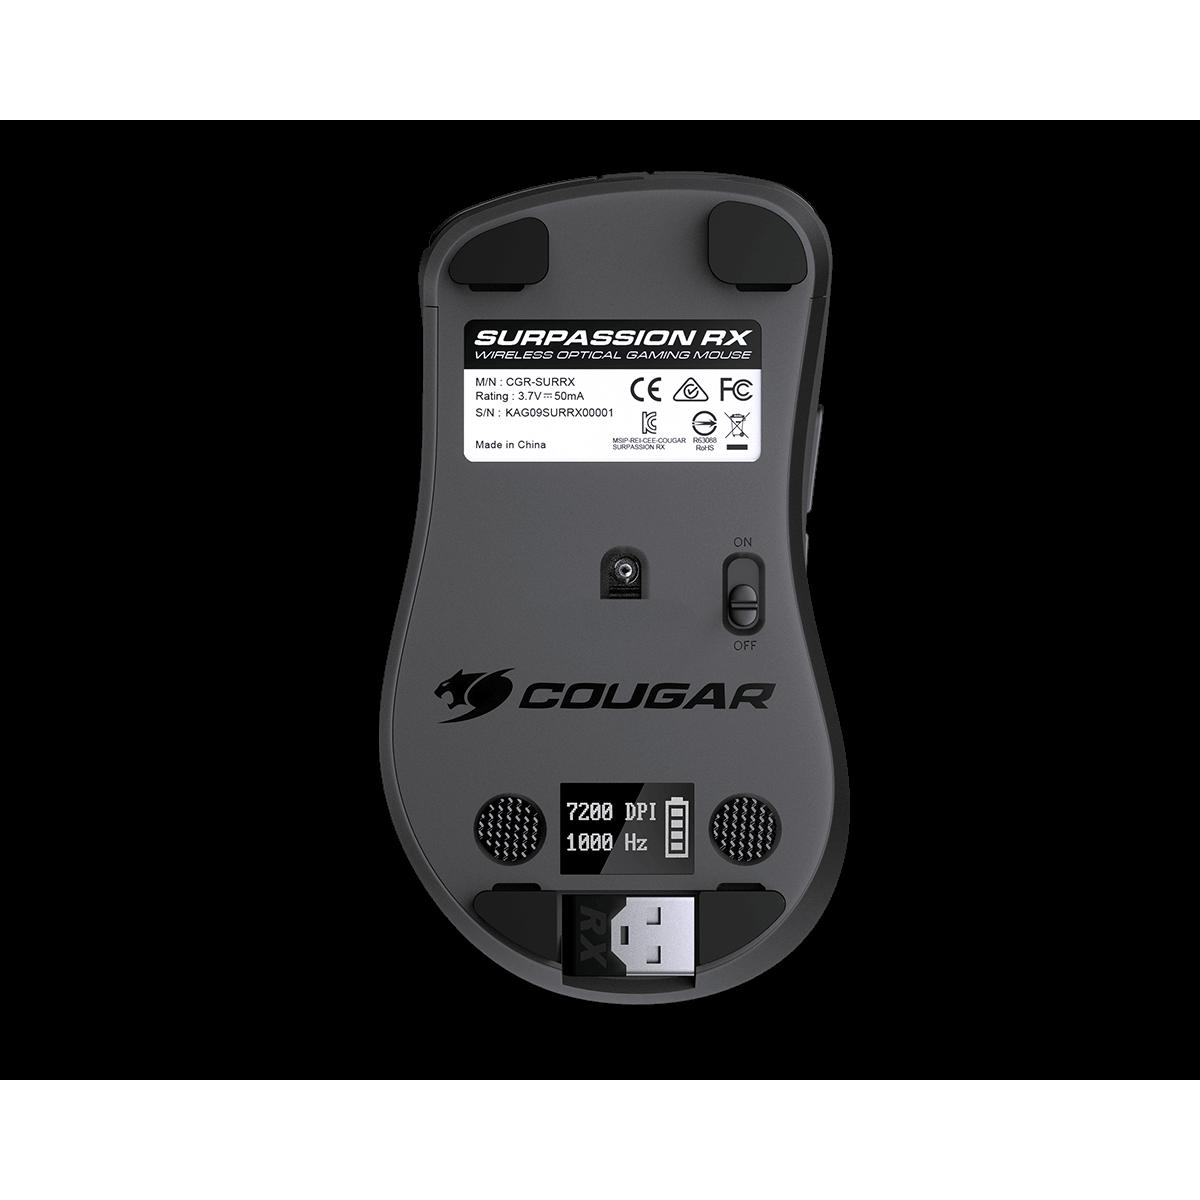 Mouse Cougar Surpassion RX, 7200 DPI, Wireless, Black, 3MSRFWOB.0001